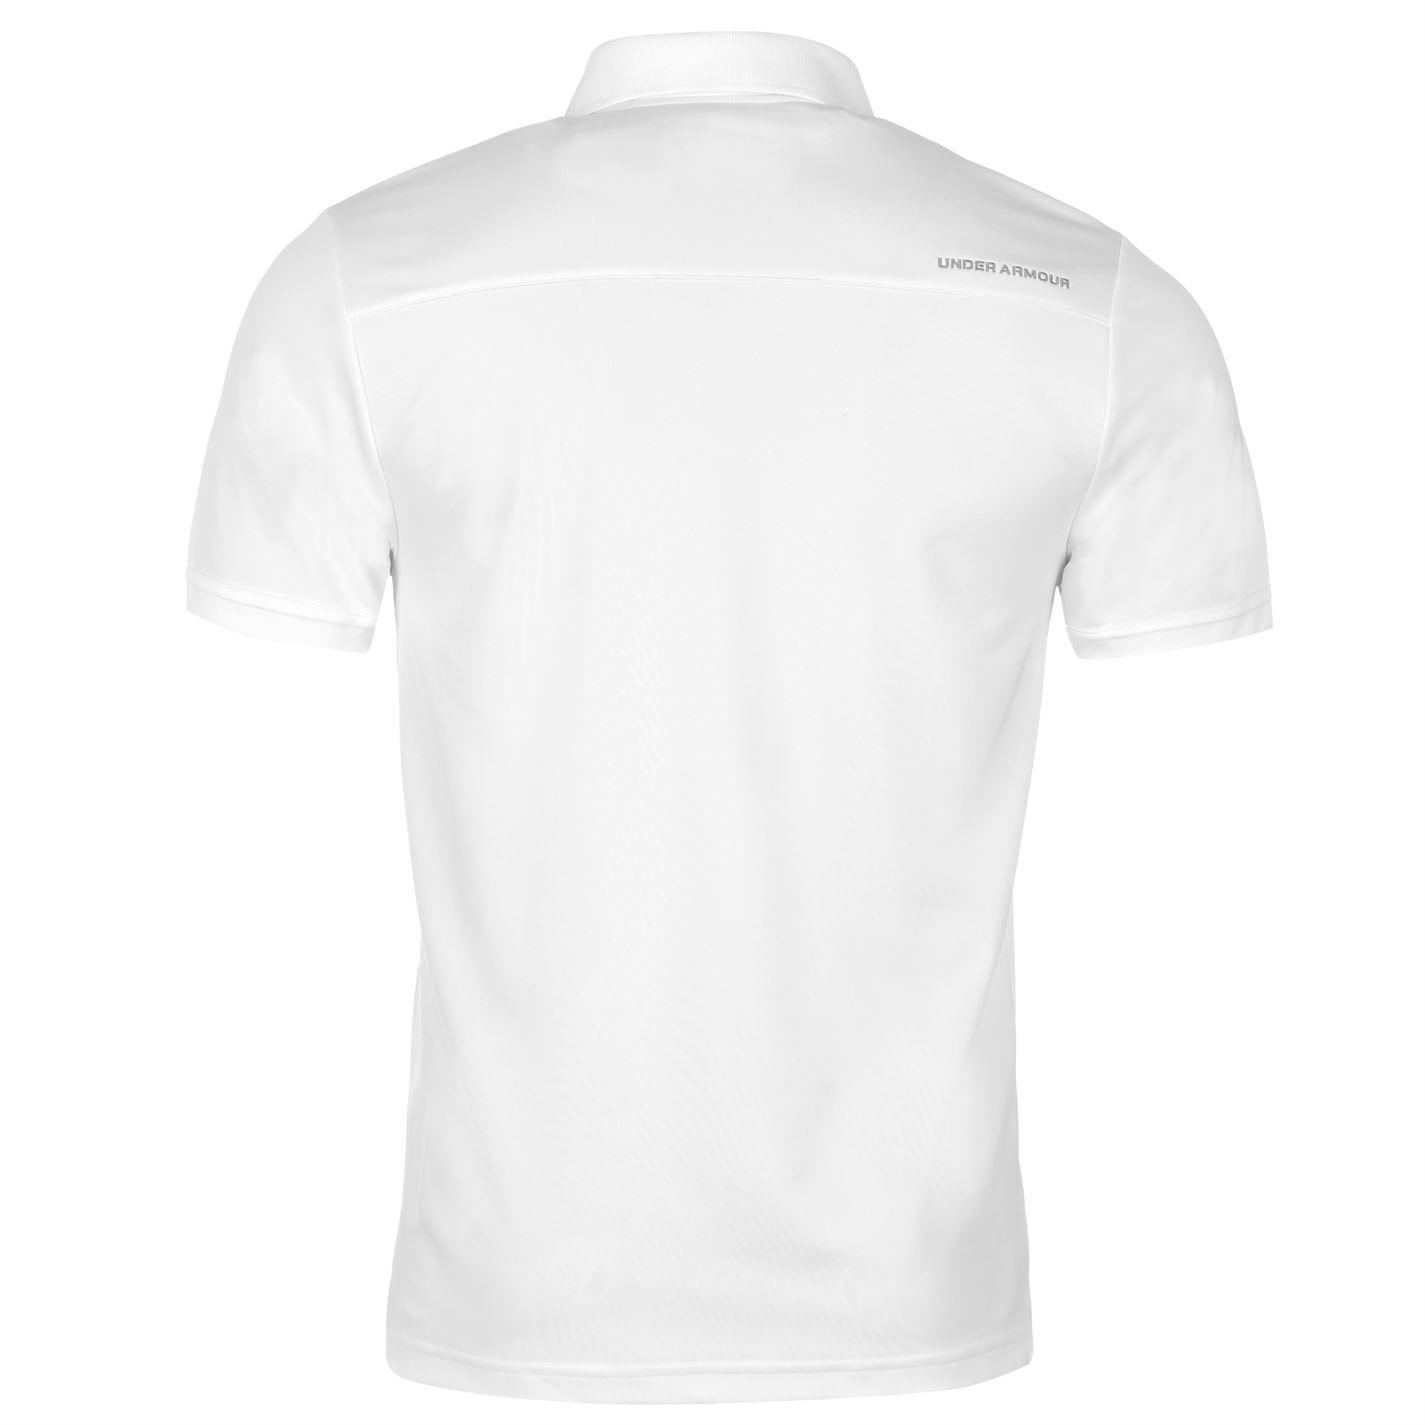 Under-Armour-Camiseta-Polo-para-hombre-realizar-Manga-Corta-Camiseta-Top-Golf-Deportes miniatura 31